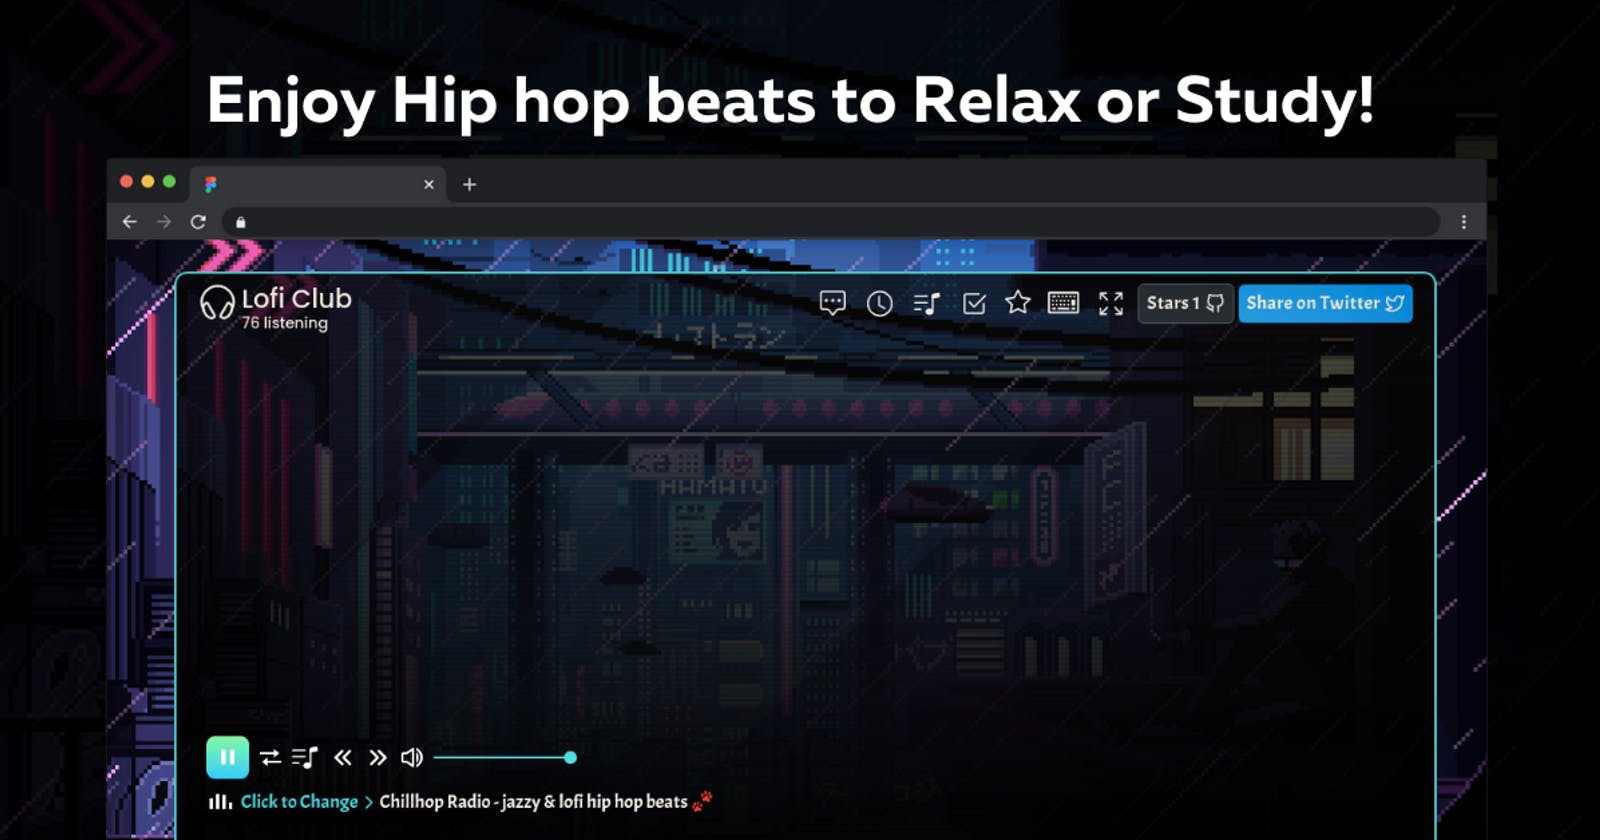 Introducing Lofi Club - Enjoy Hip hop beats to Relax or Code! 🎧